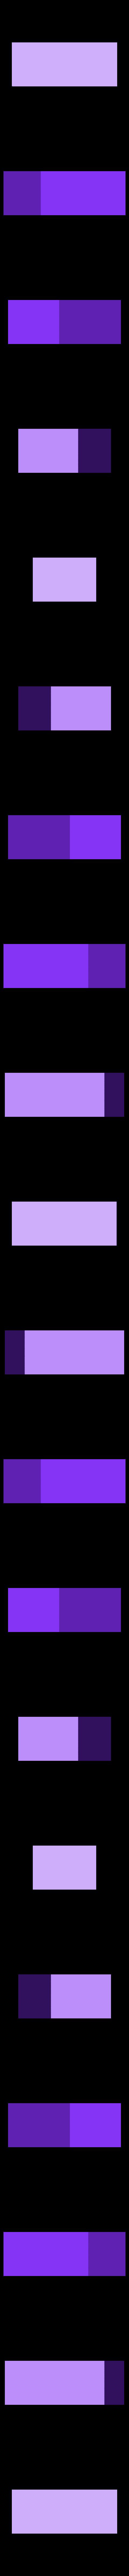 BASE LLAVES.STL Download free STL file MULTIUSE BOX • 3D printing object, ELBONAERENSE